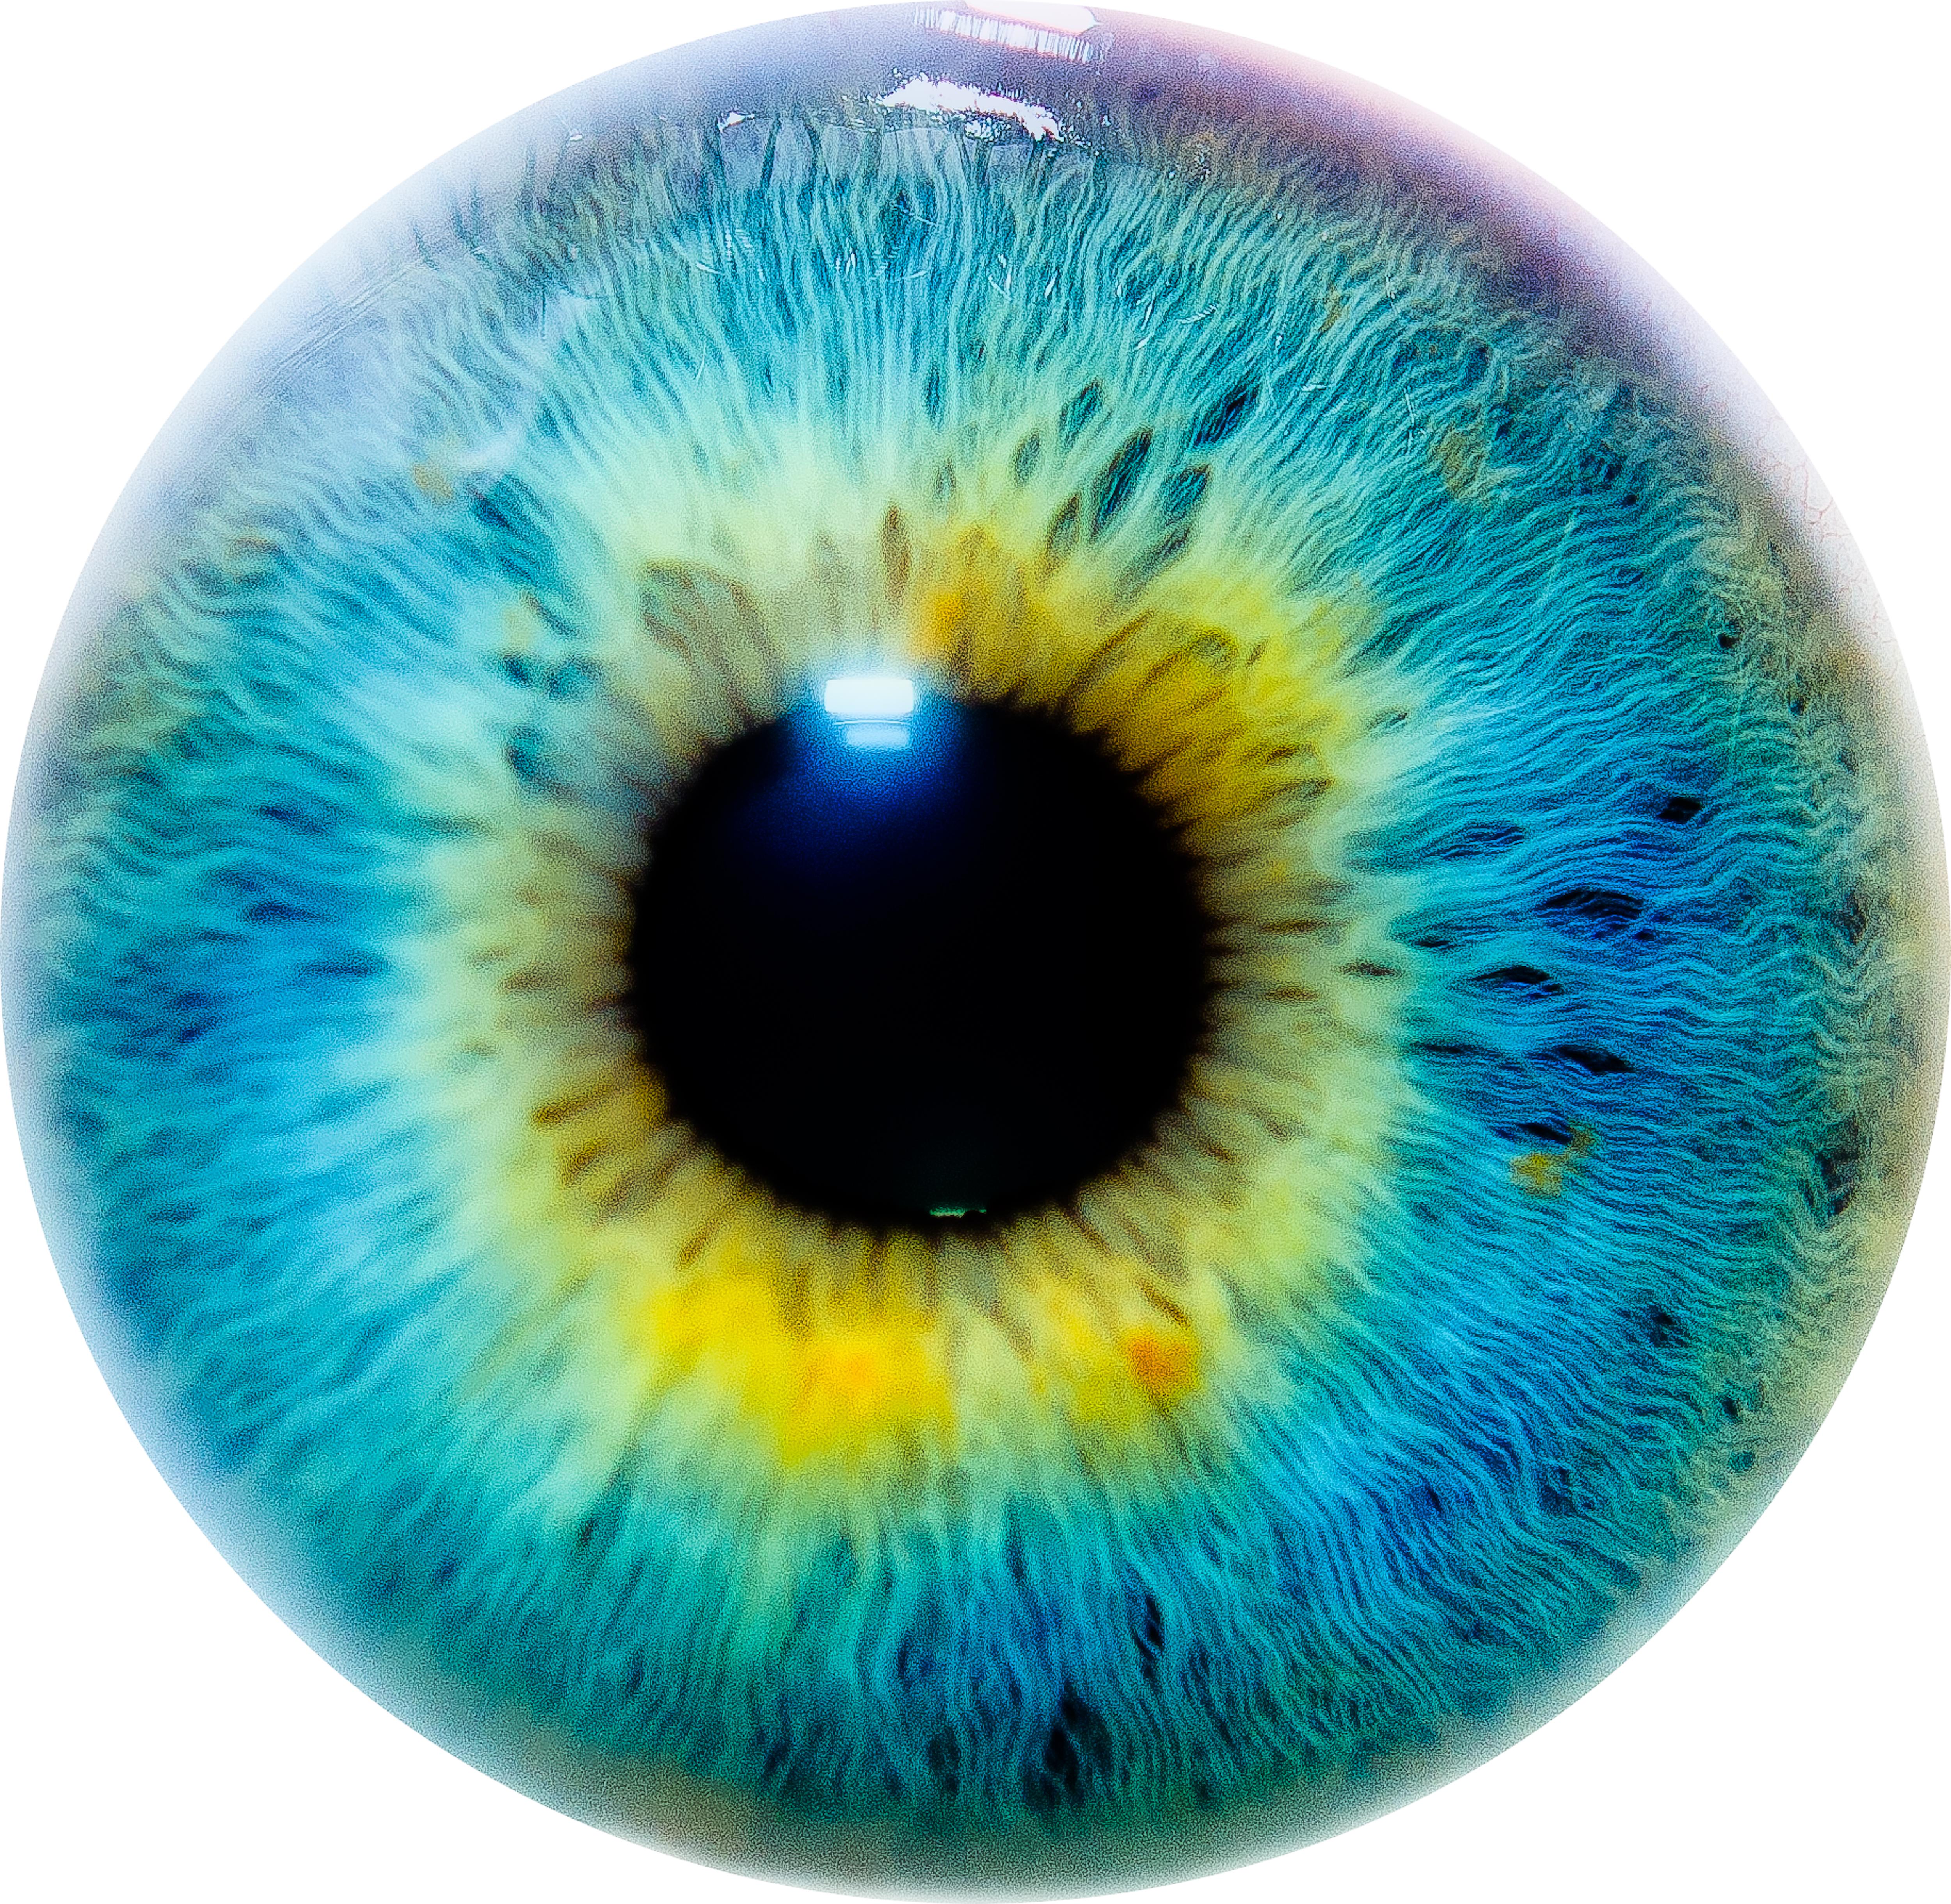 High Resolution Wallpaper | Eye 5000x4880 px